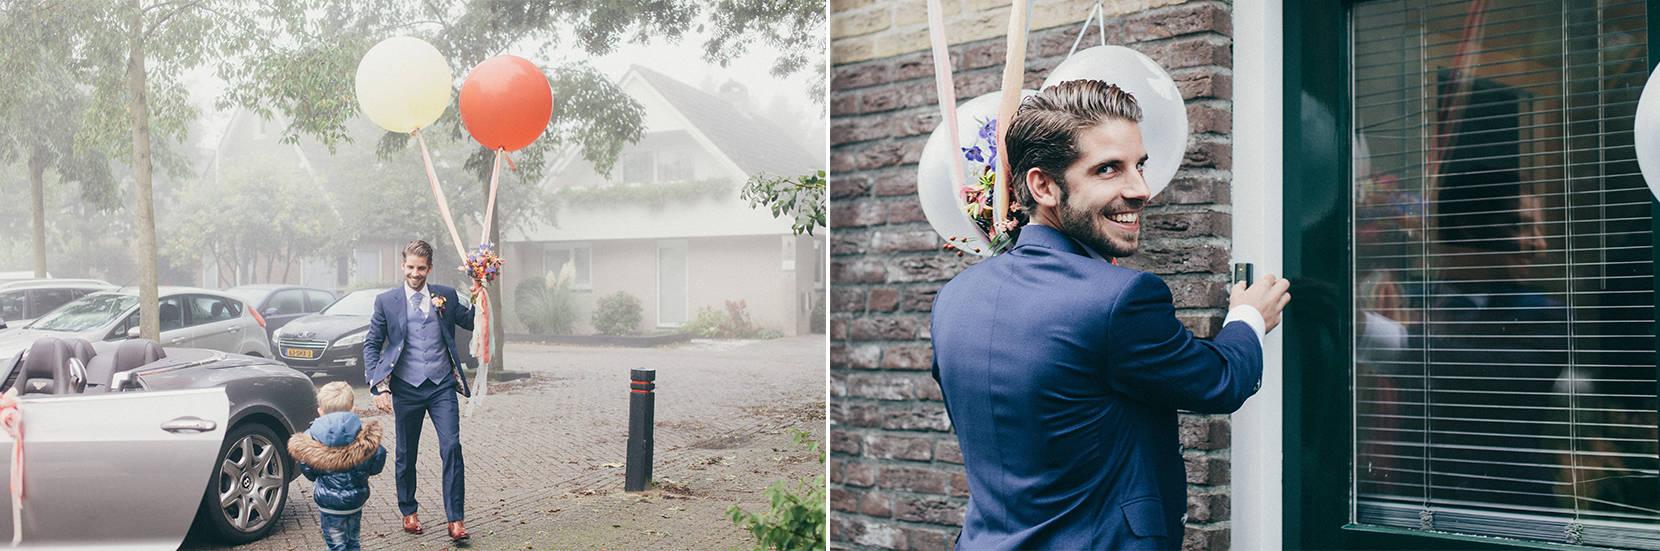 Bruidsfotografie_Rotterdam_Rogier_Martine-4